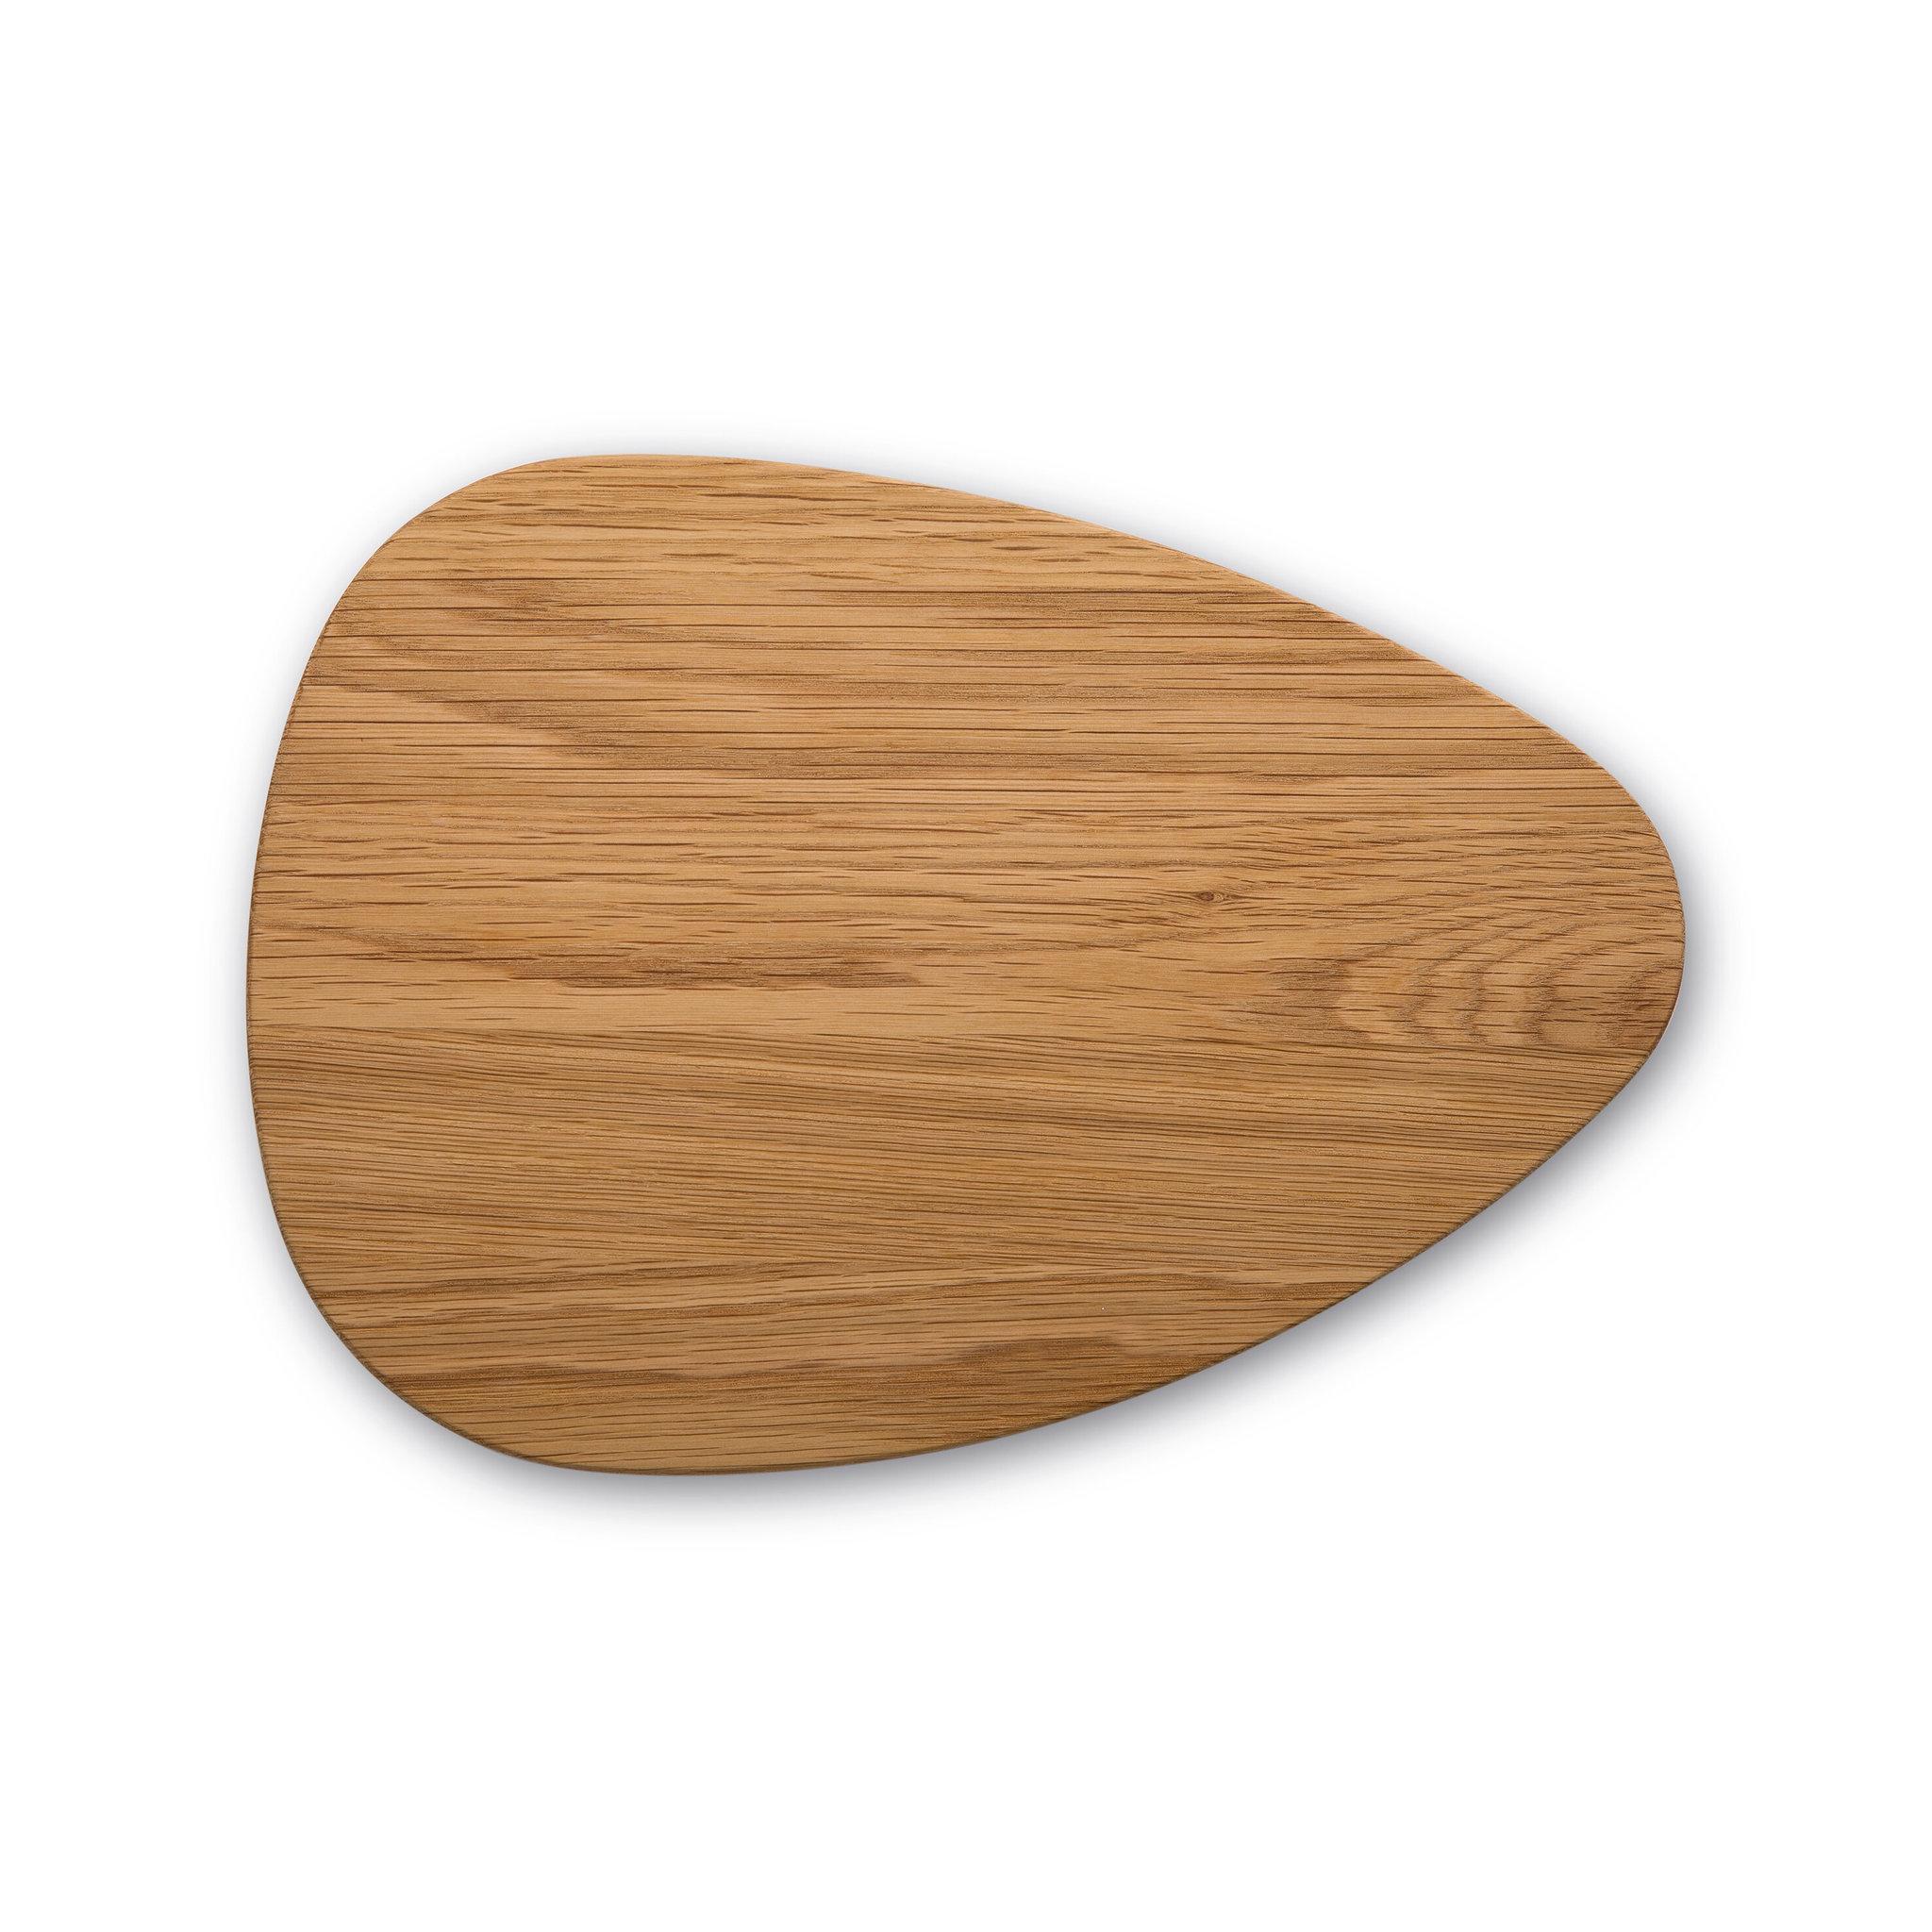 Доска разделочная в форме гальки Robert Welch, размер 32х24 см, материал дуб